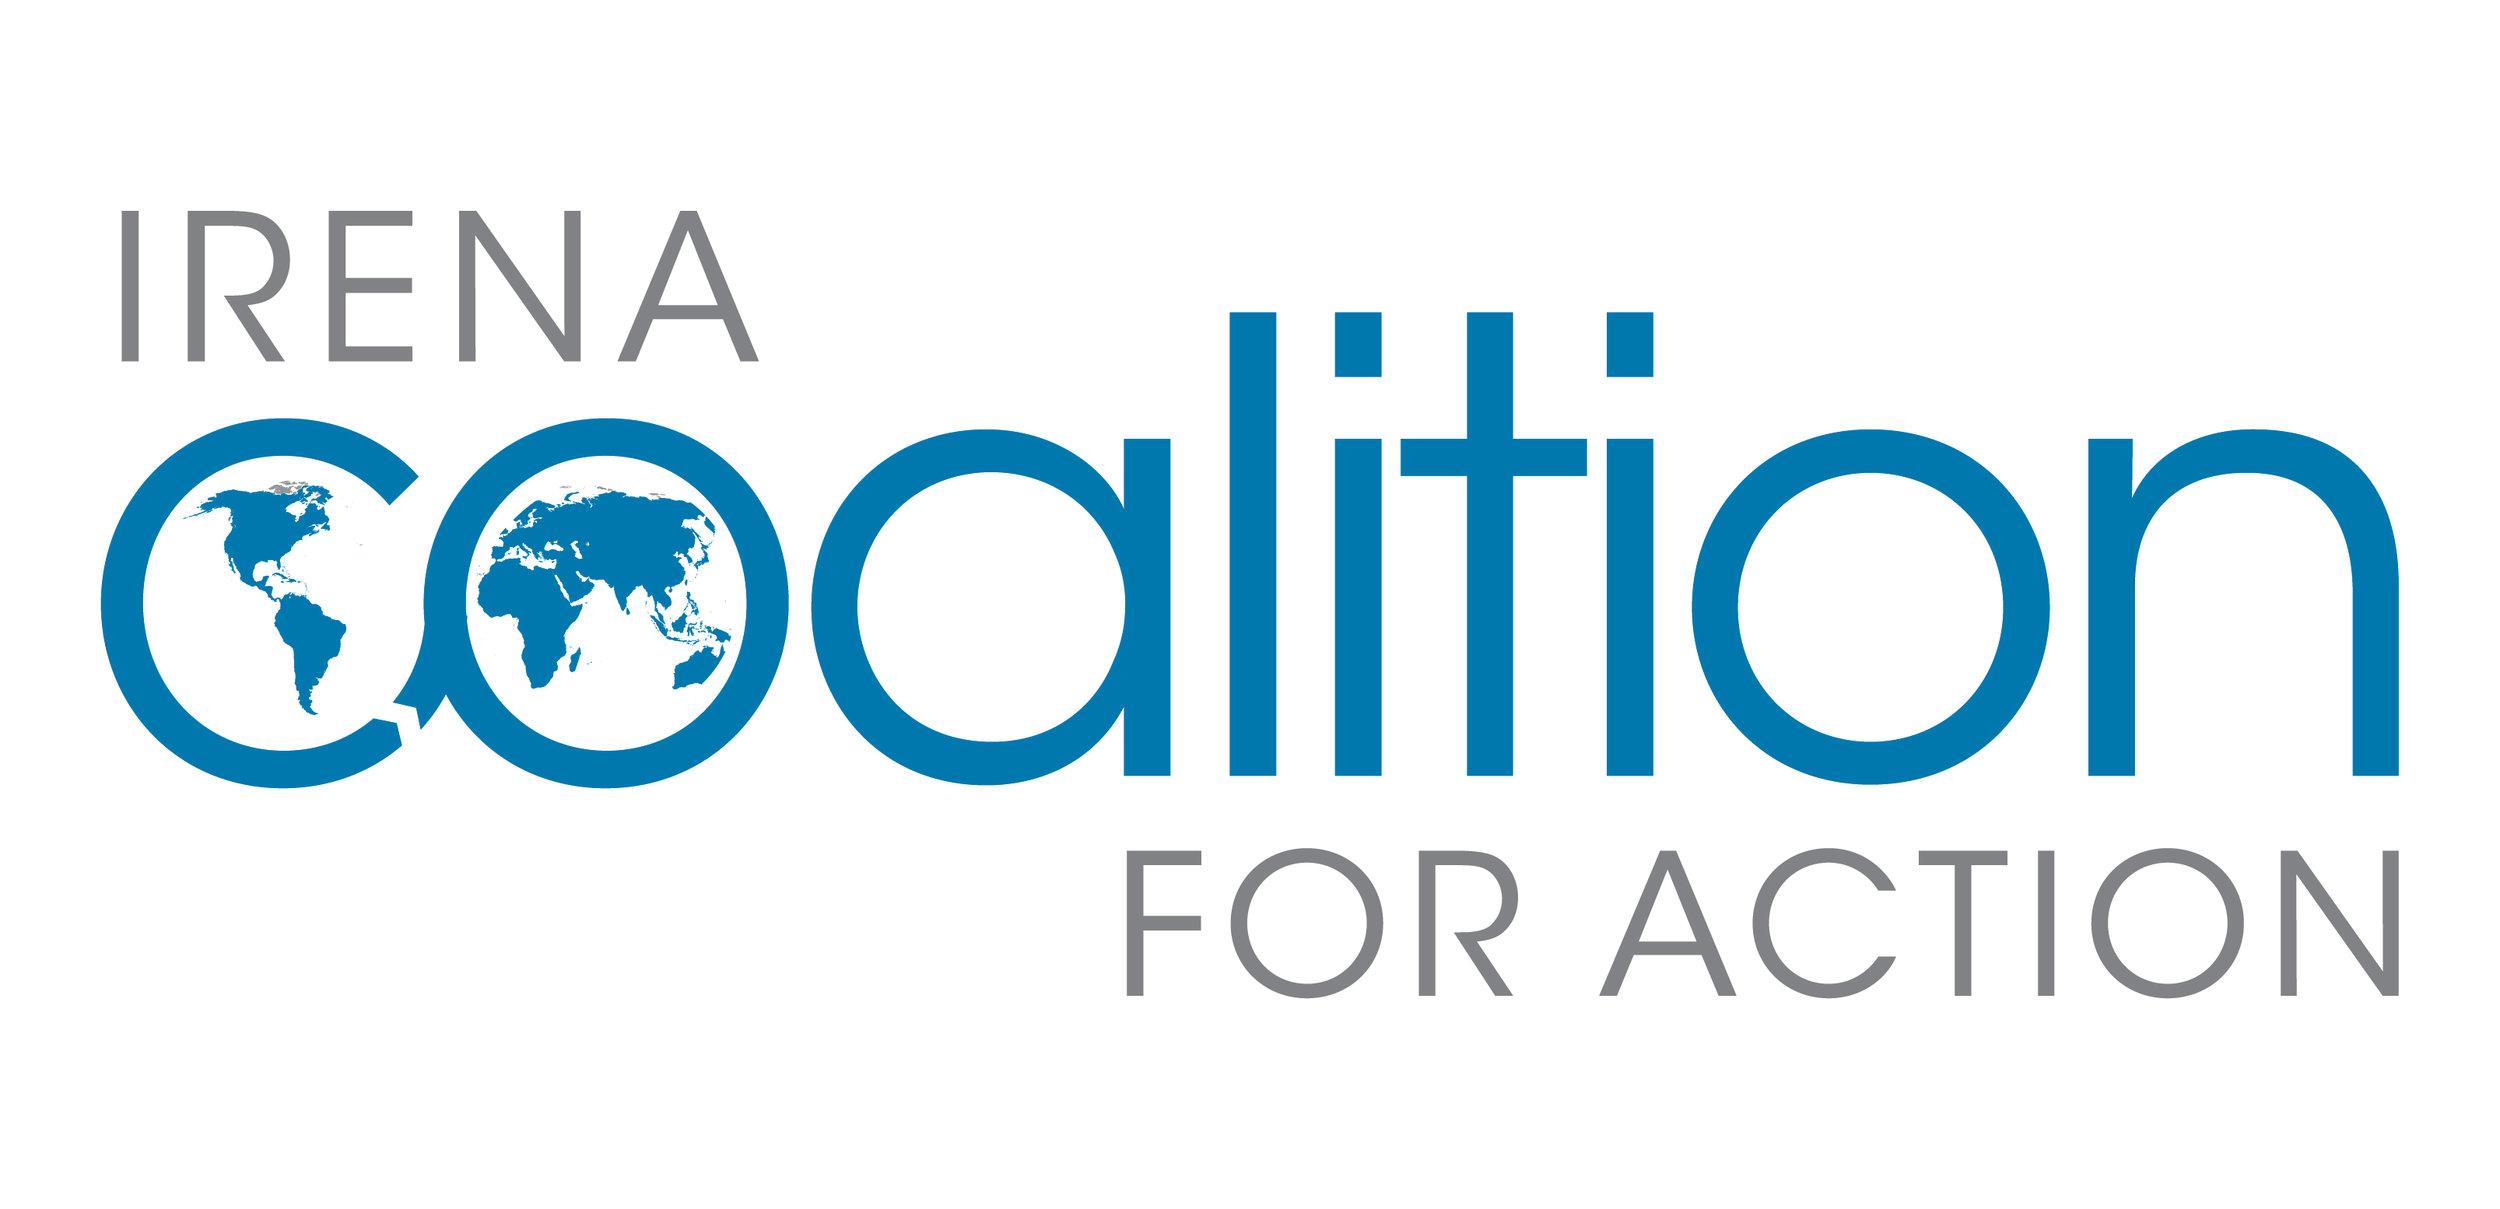 IRENA Coalition logo.jpg